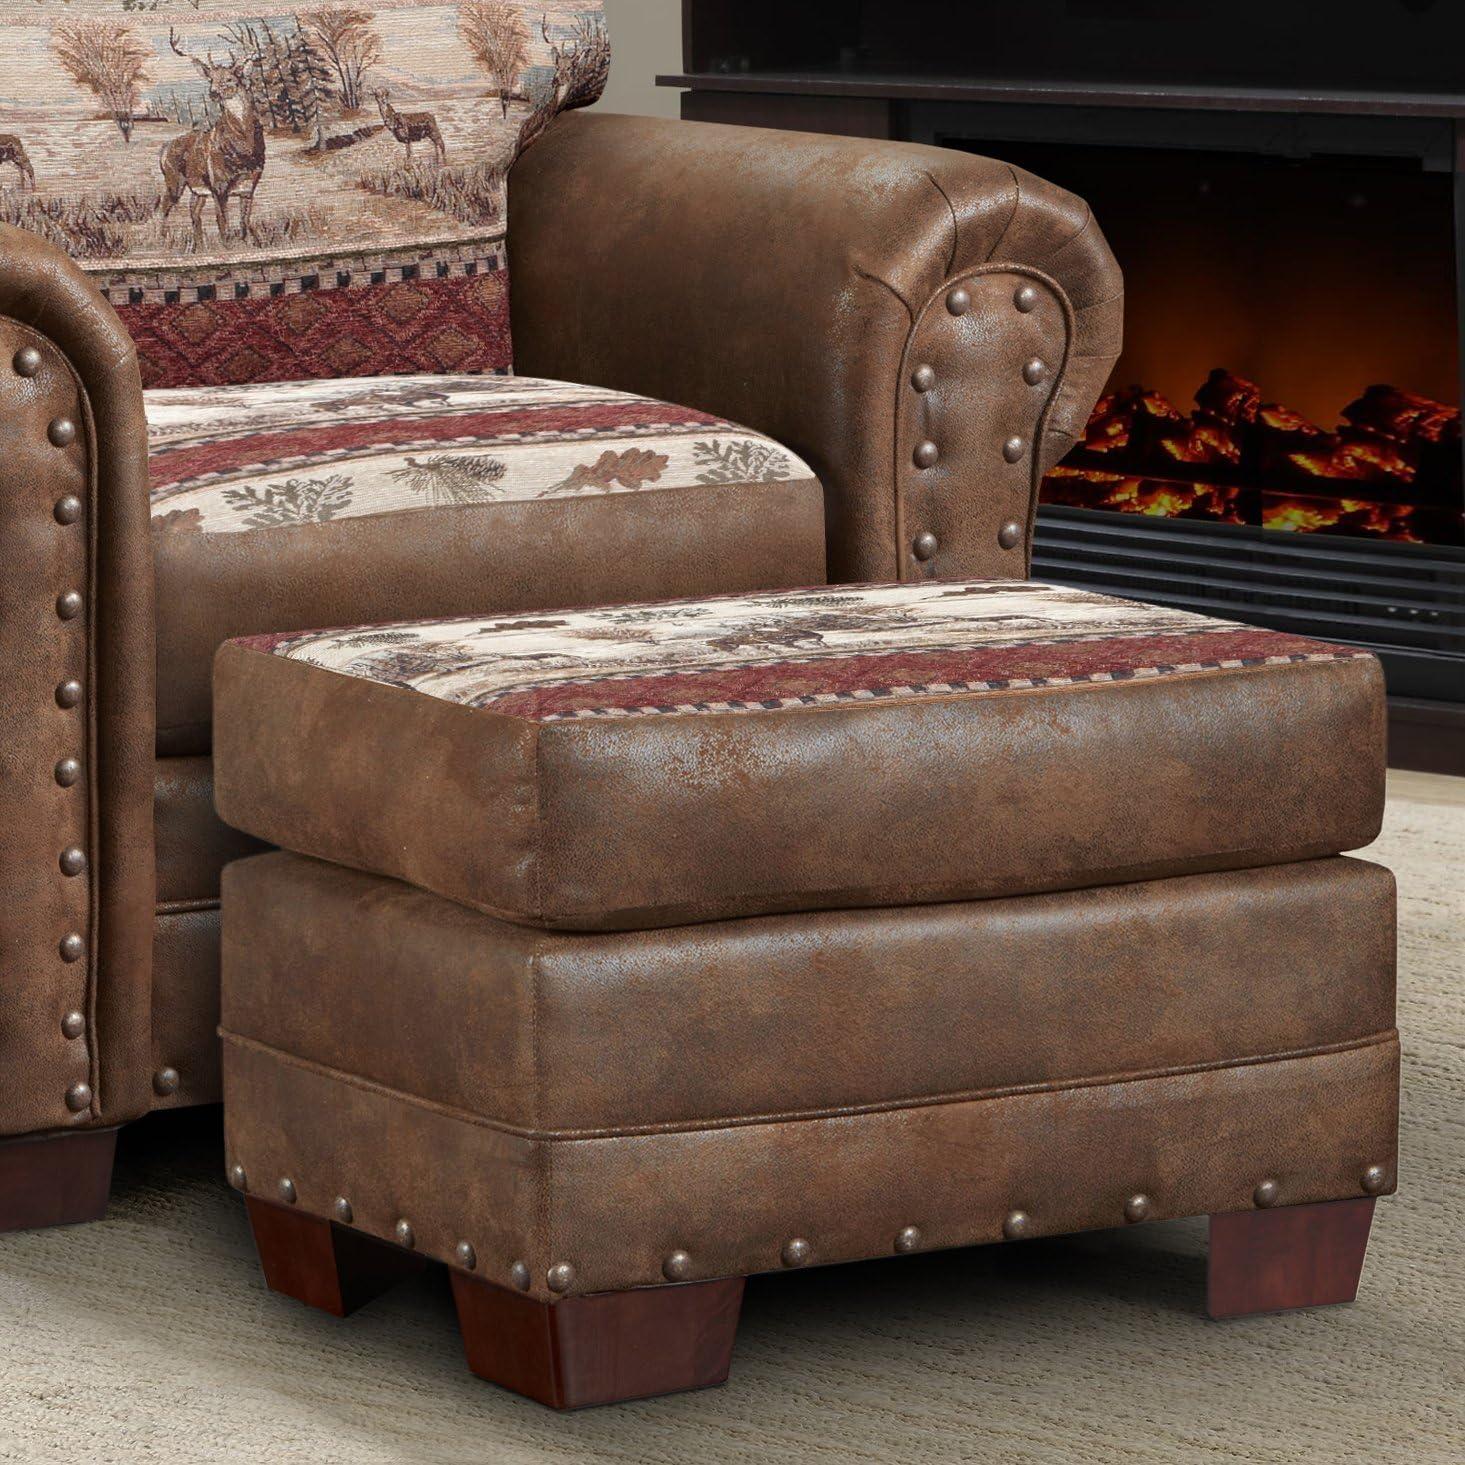 American Furniture Classics Deer Valley Ottoman